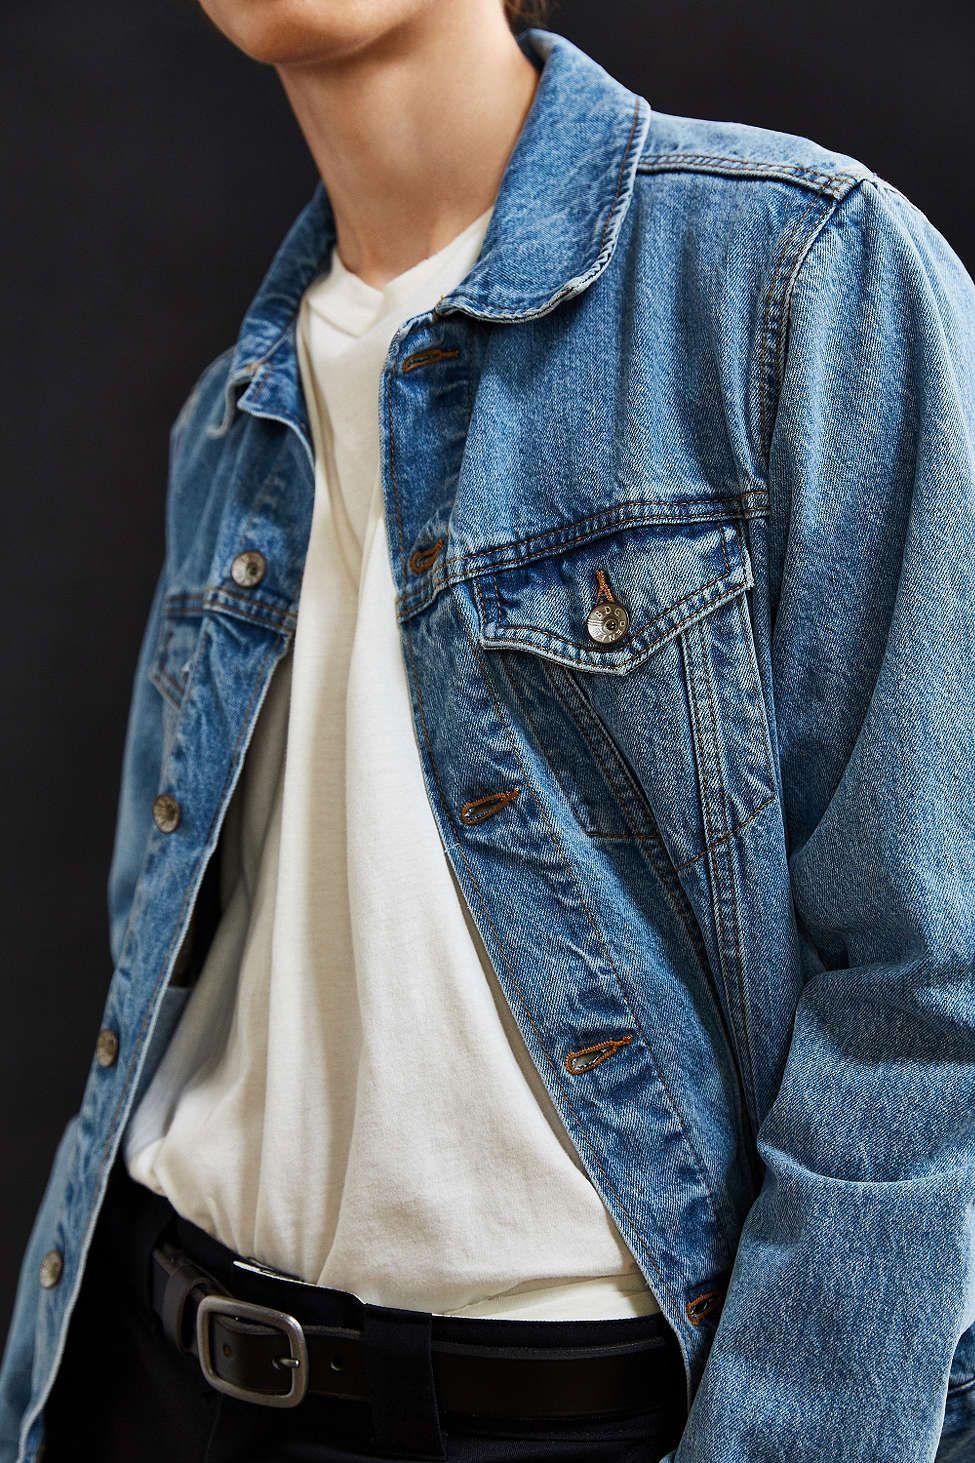 Bdg Core Denim Trucker Jacket Long Sleeve Denim Jacket Denim Jacket Outfit Vintage Denim Jacket [ 1463 x 975 Pixel ]